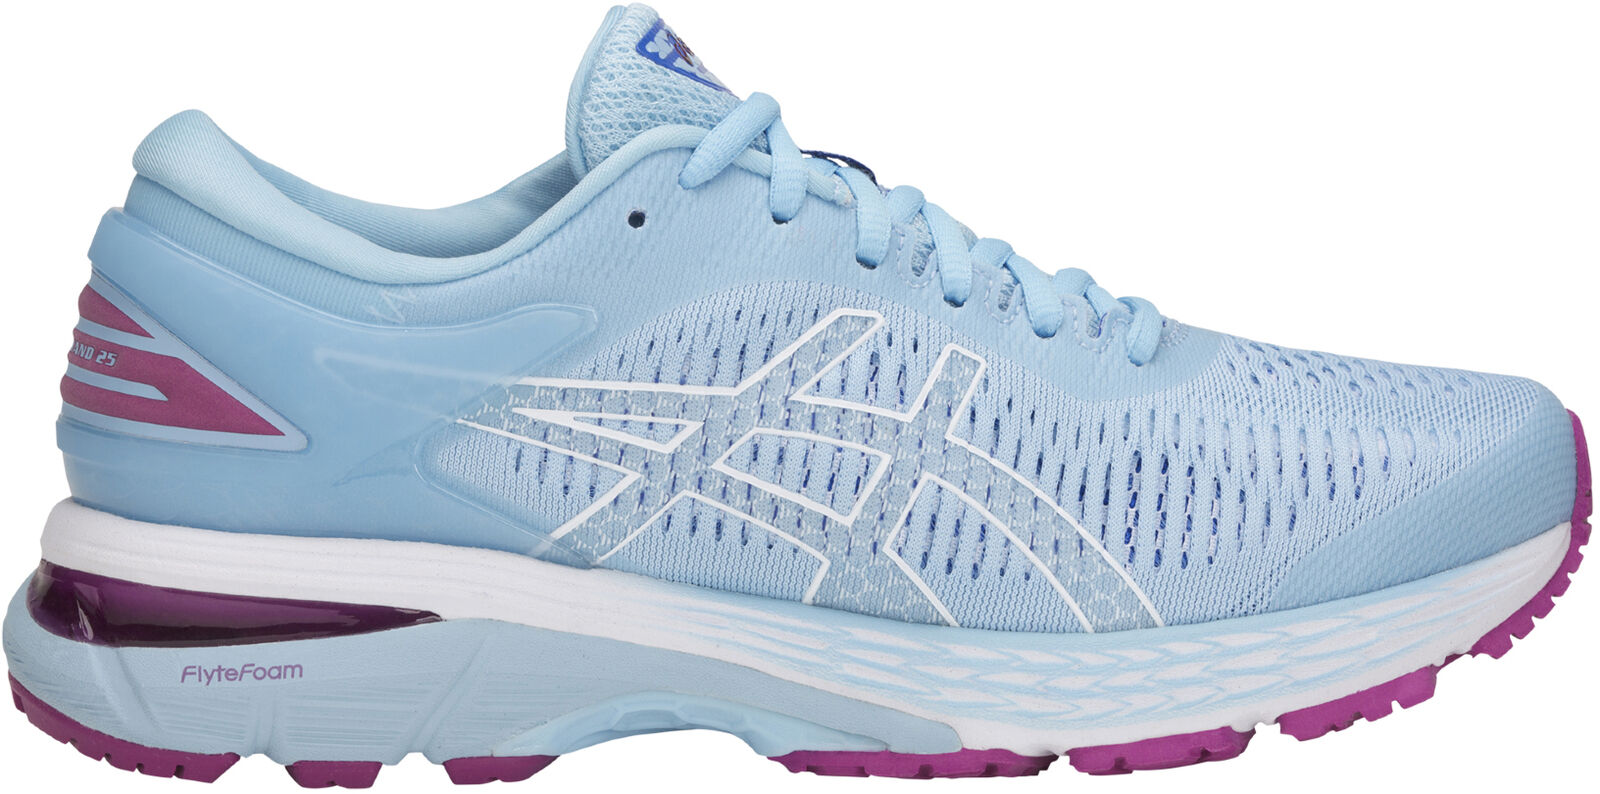 Asics Gel Kayano 25 Womens Running shoes - bluee